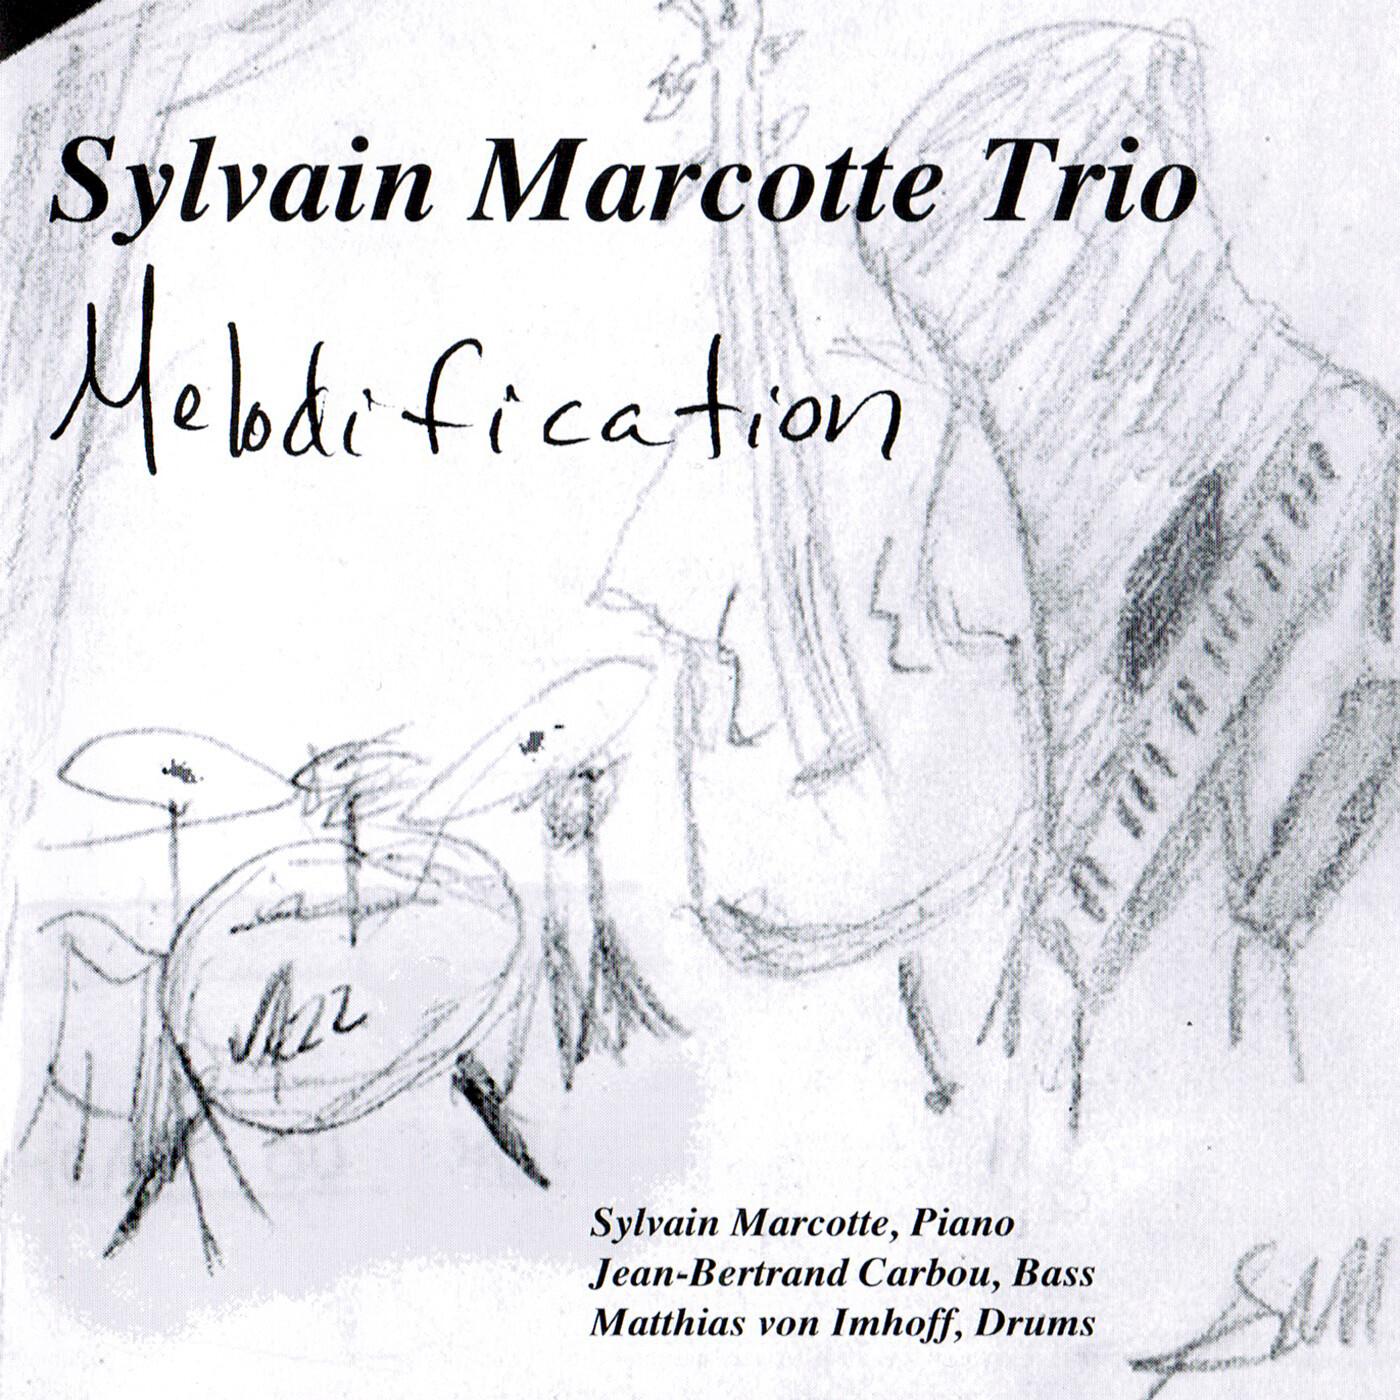 Melodification - Sylvain Marcotte Trio